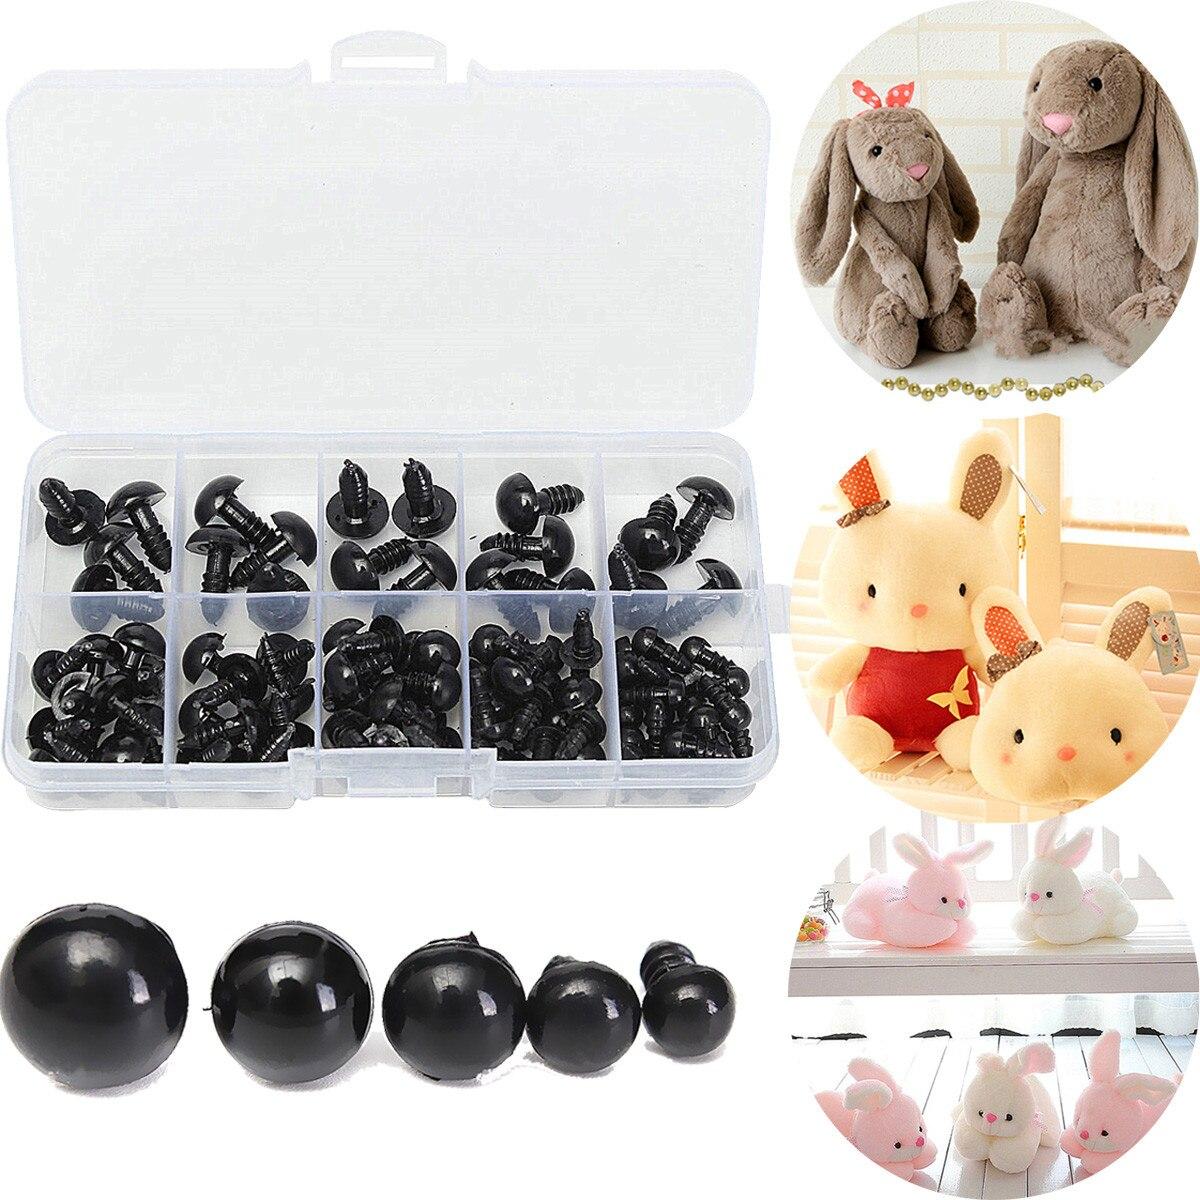 Wholesale 100pcs/box 6-12mm Black Plastic Safety Eyes For Teddy Bear Doll Animal Crafts Box Doll Cartoon Animal Puppet Crafts